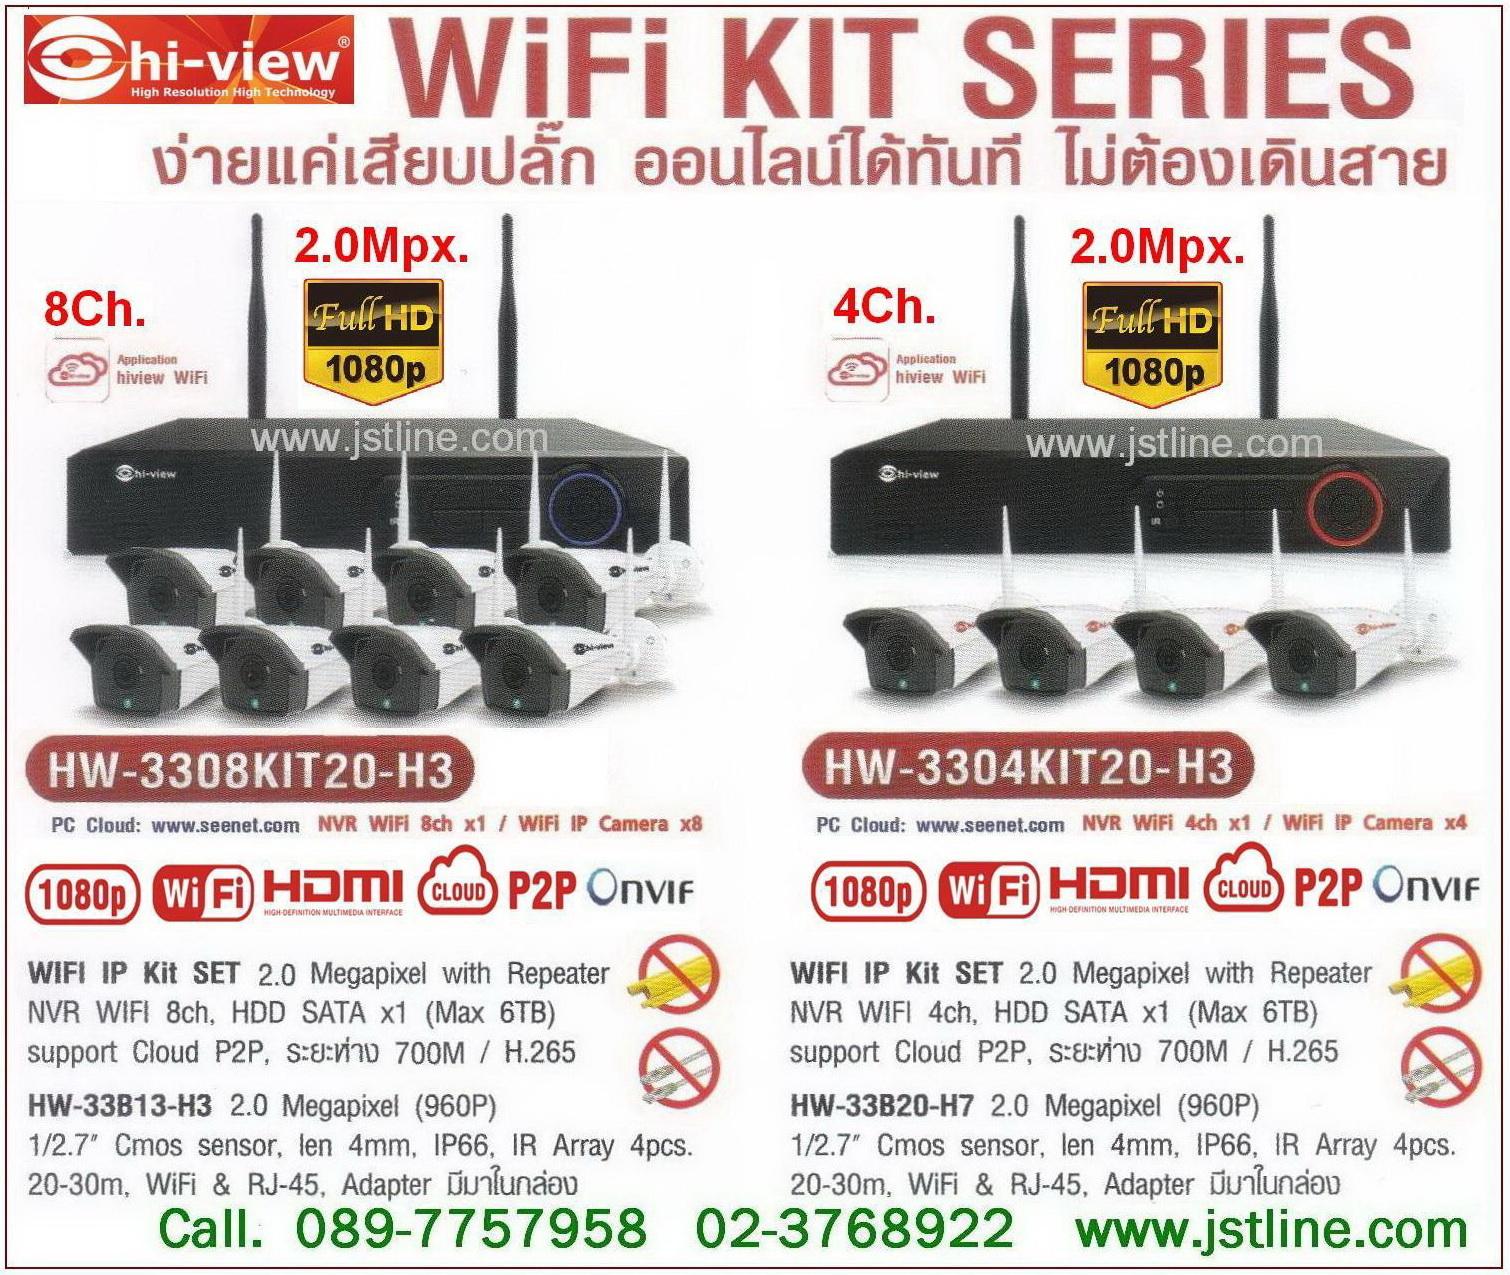 hiview cctv WiFi  KIT